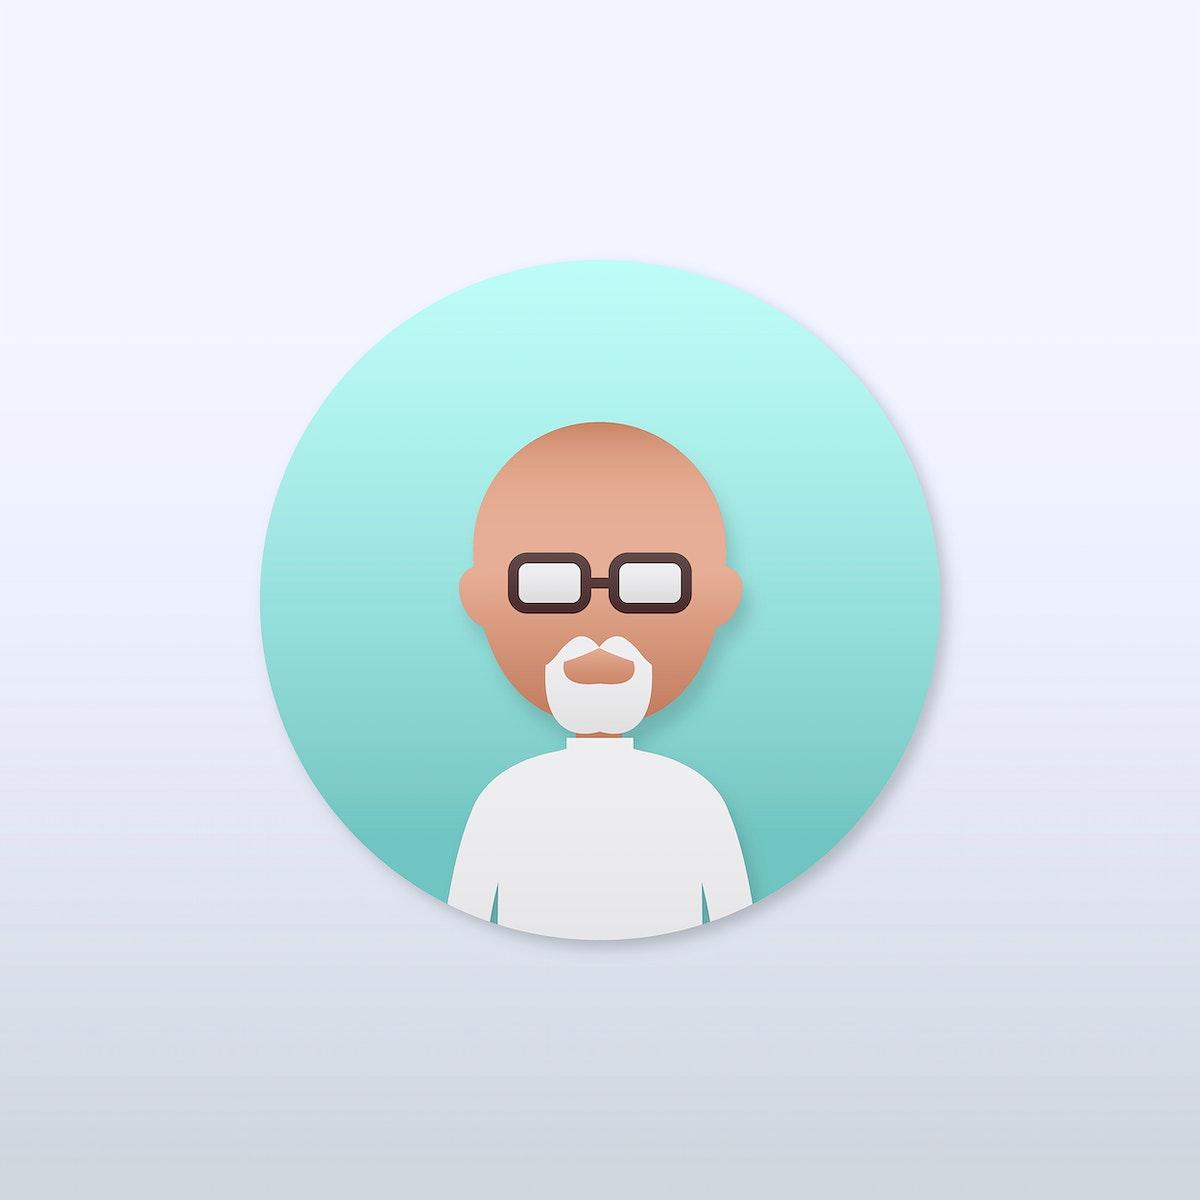 Senior man with white beard avatar illustration